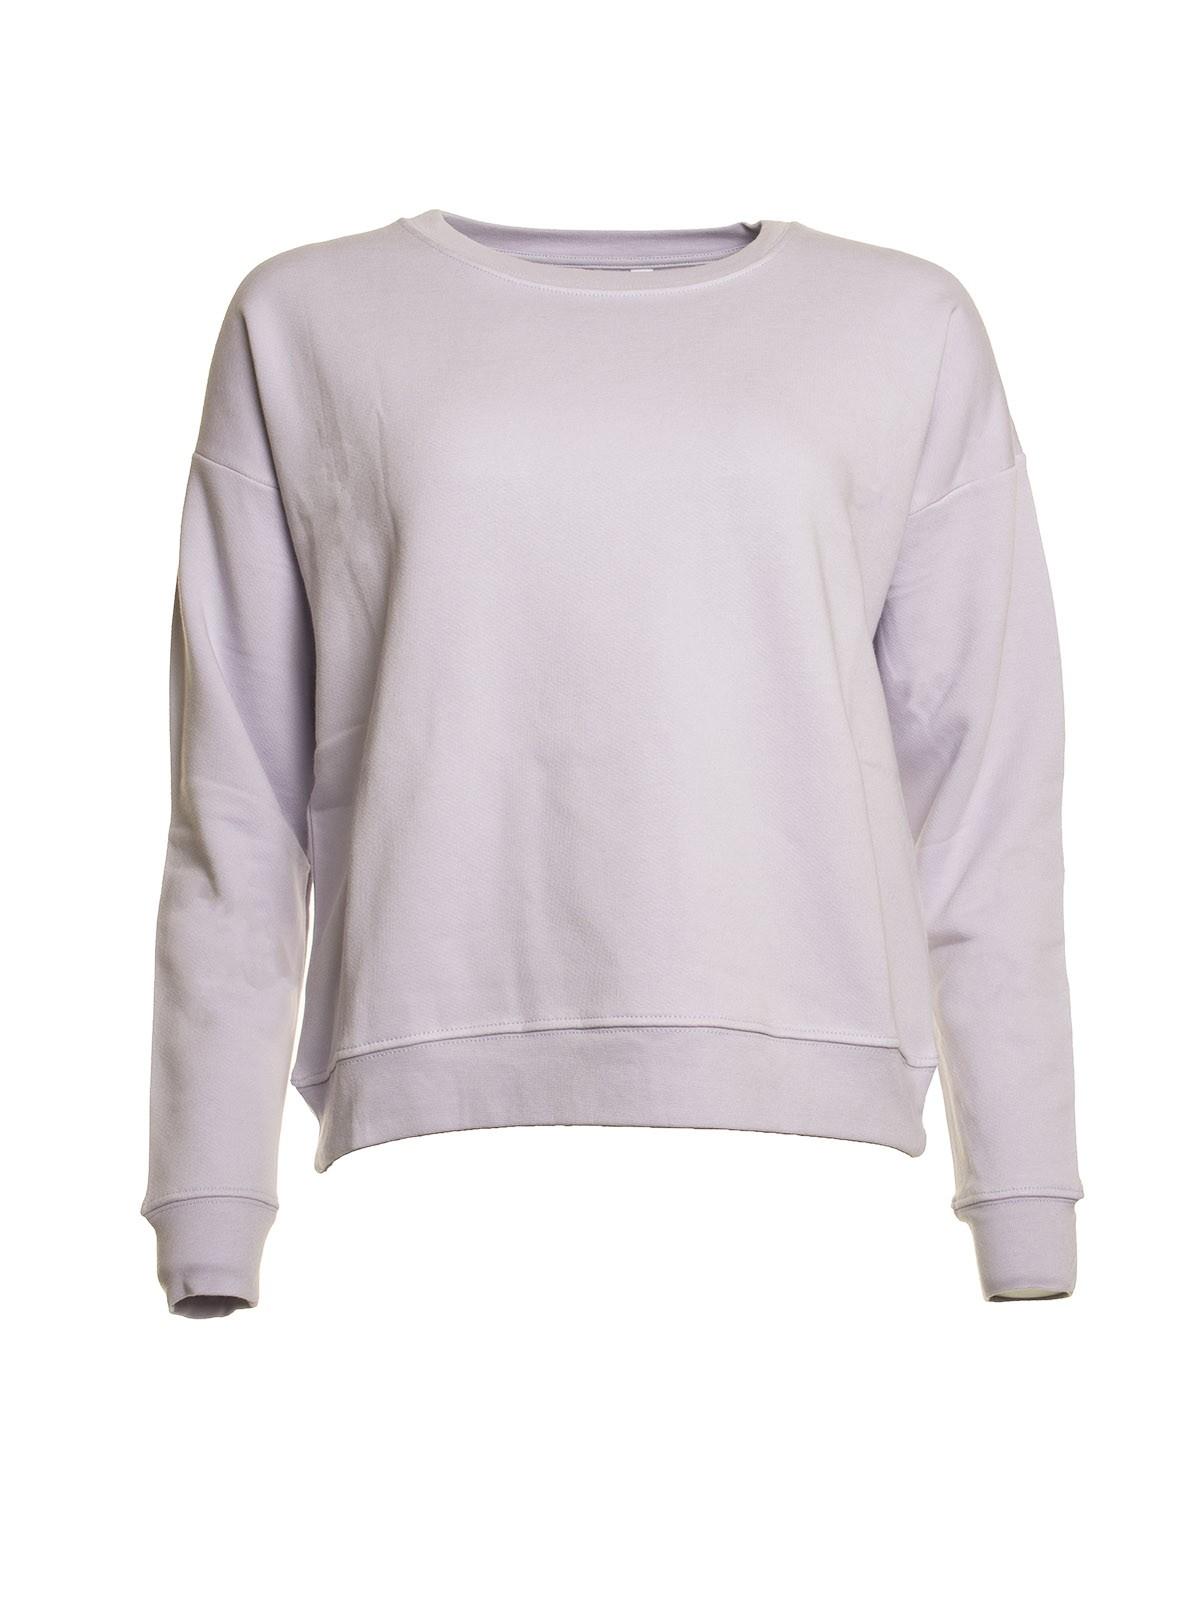 8ca4a0017d5 San Jose Sweatshirt Great Plains Katie Kerr Women s Clothing